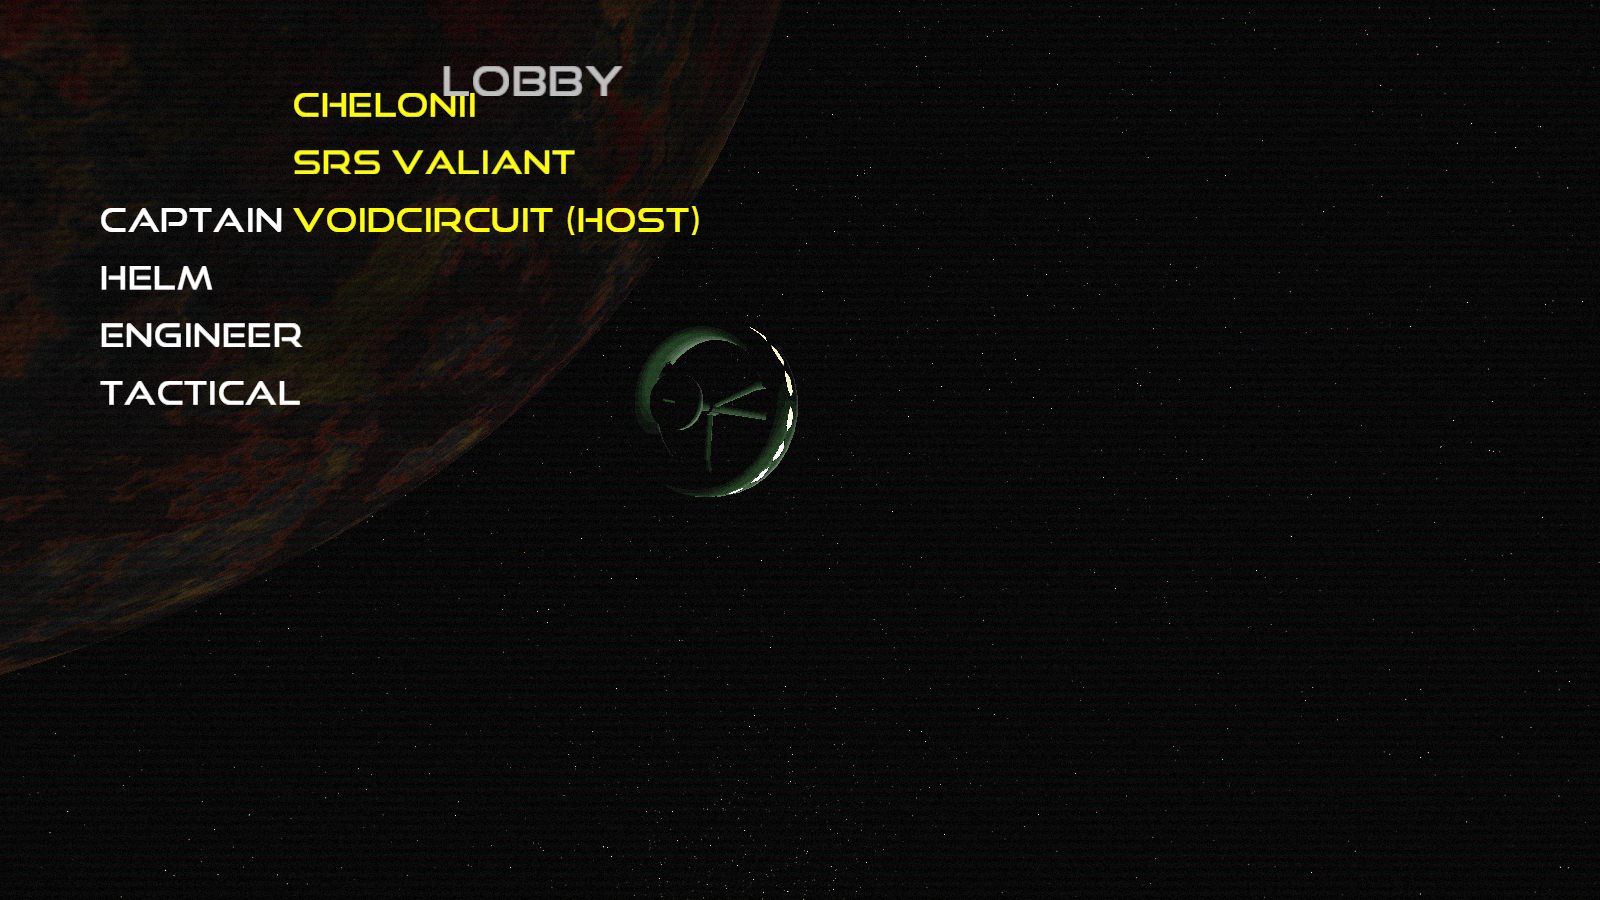 Screenshot 2014-06-04 12-48-04.png